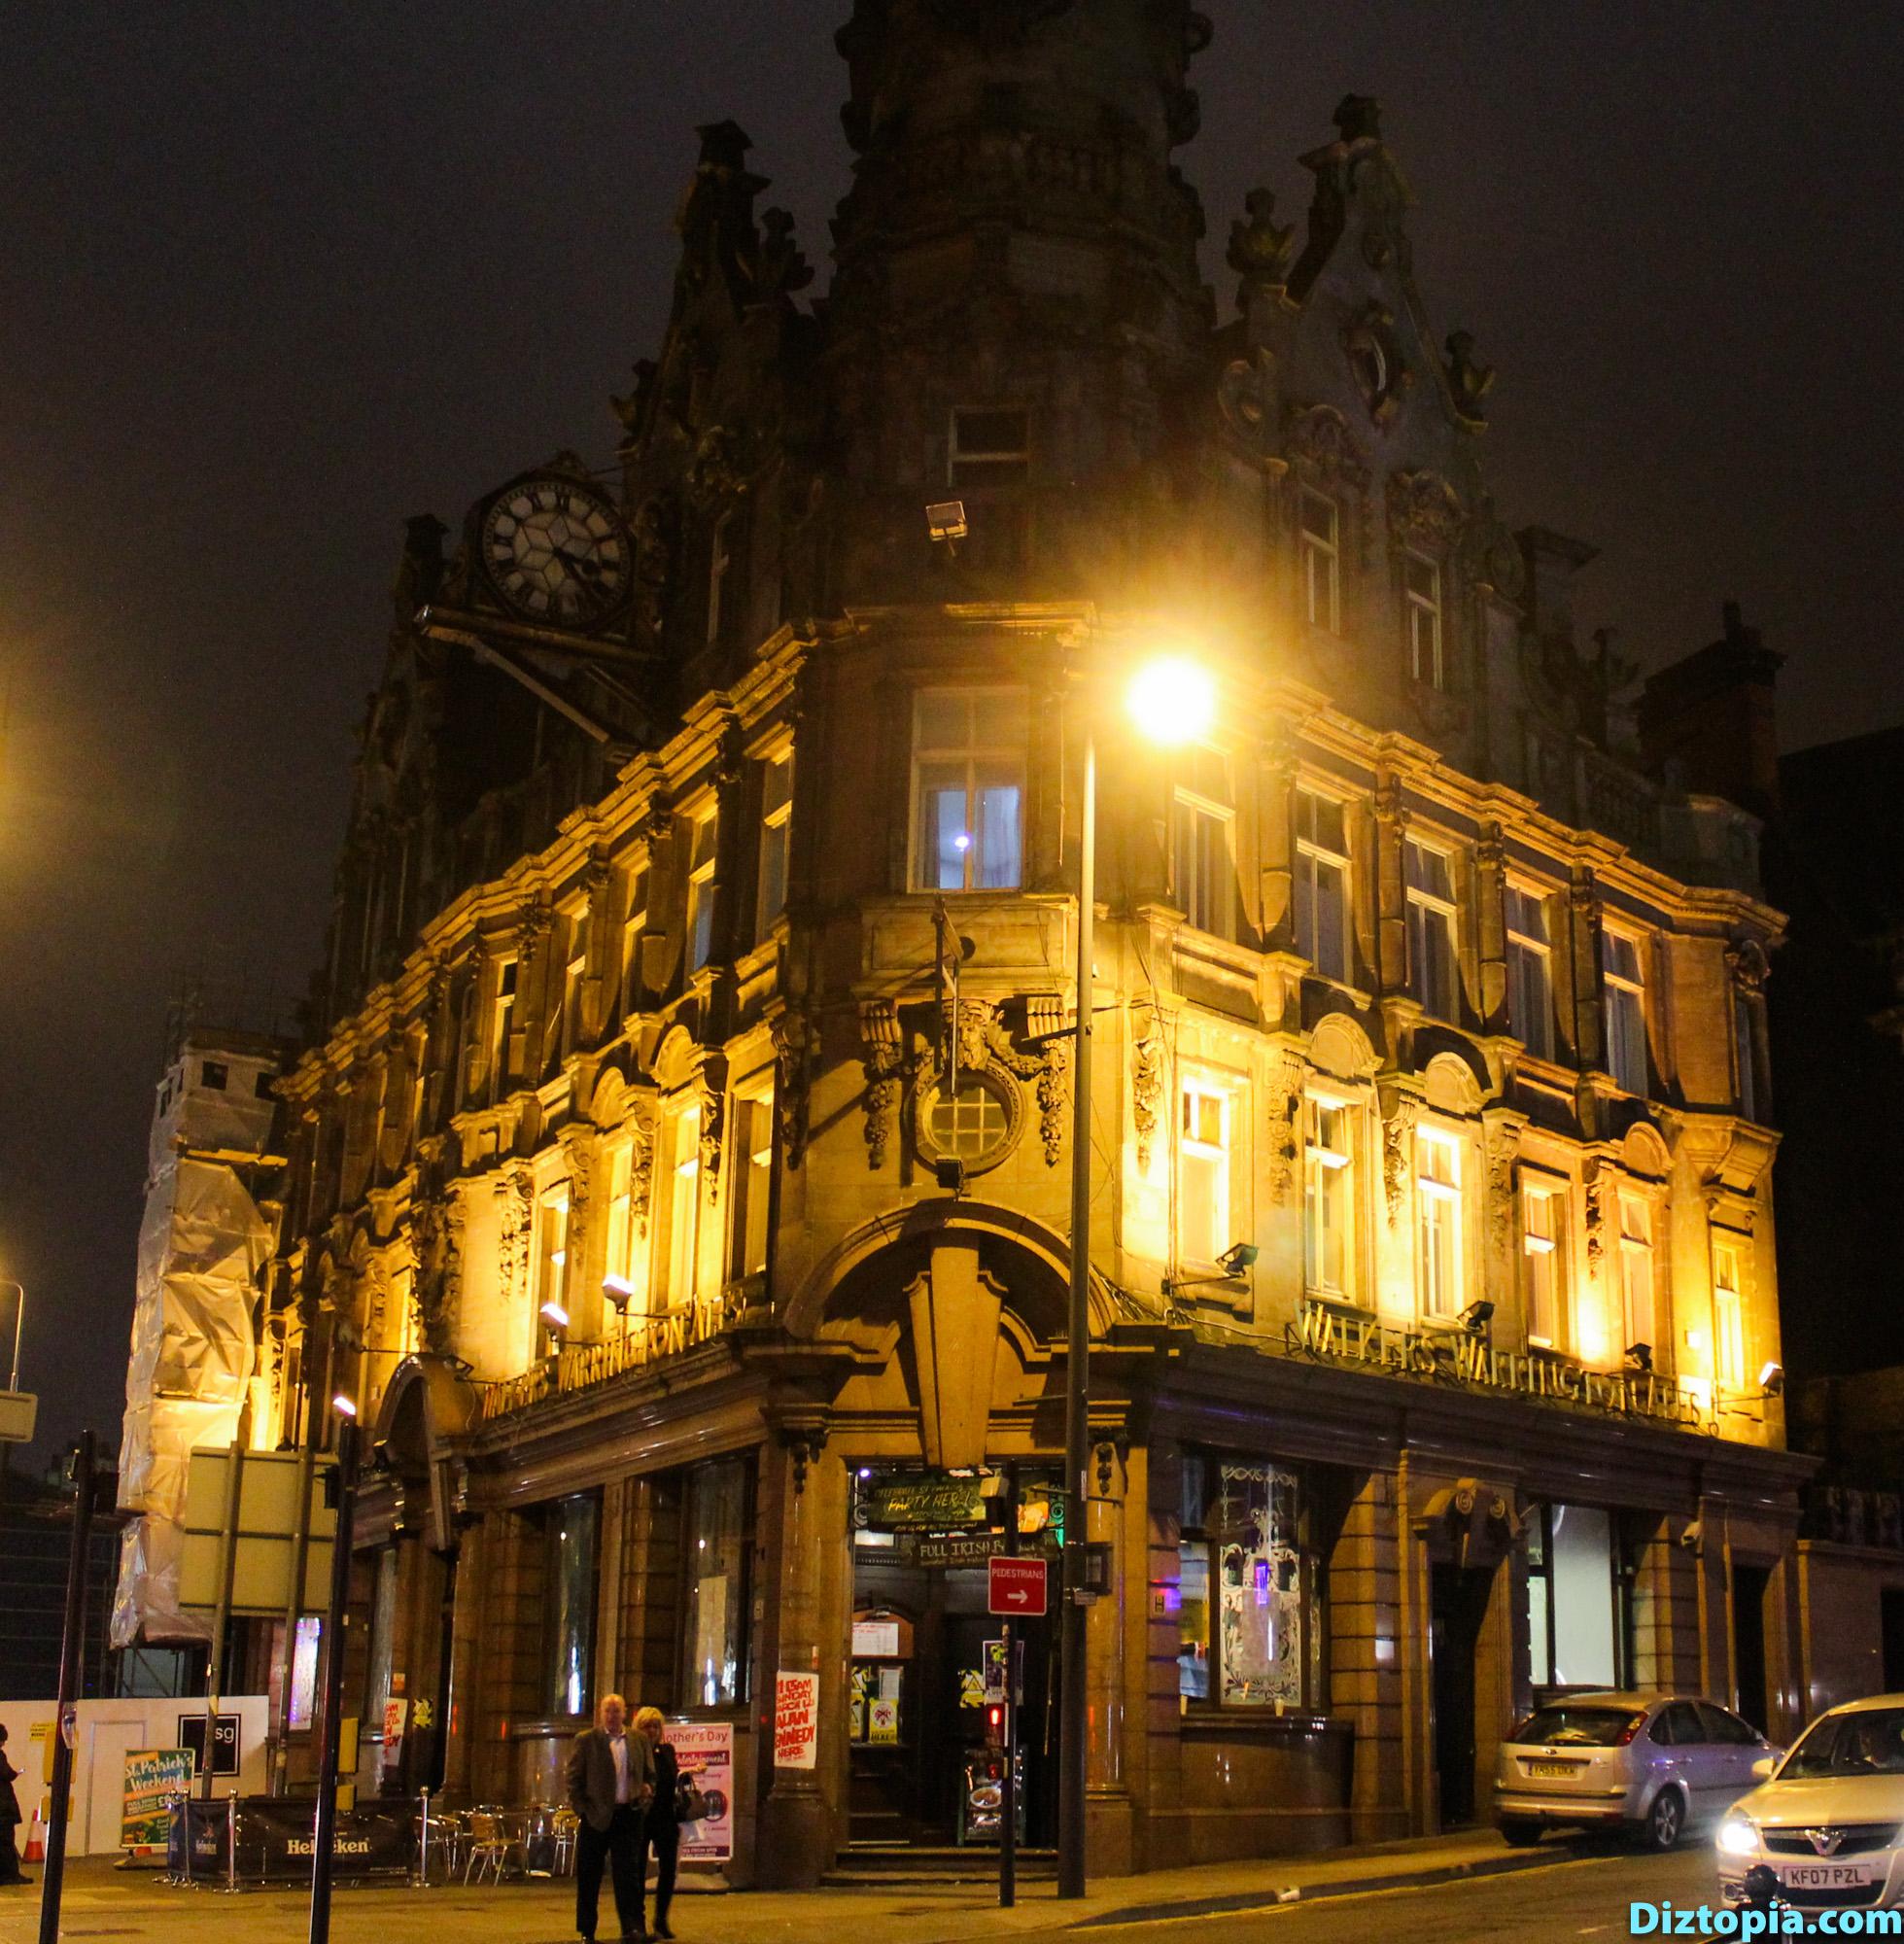 Liverpool-City-UK-Diztopia-Dizma-Dahl-Photography-2017-46-Centre-Heart-Night-Walkers-Warrington-Ales